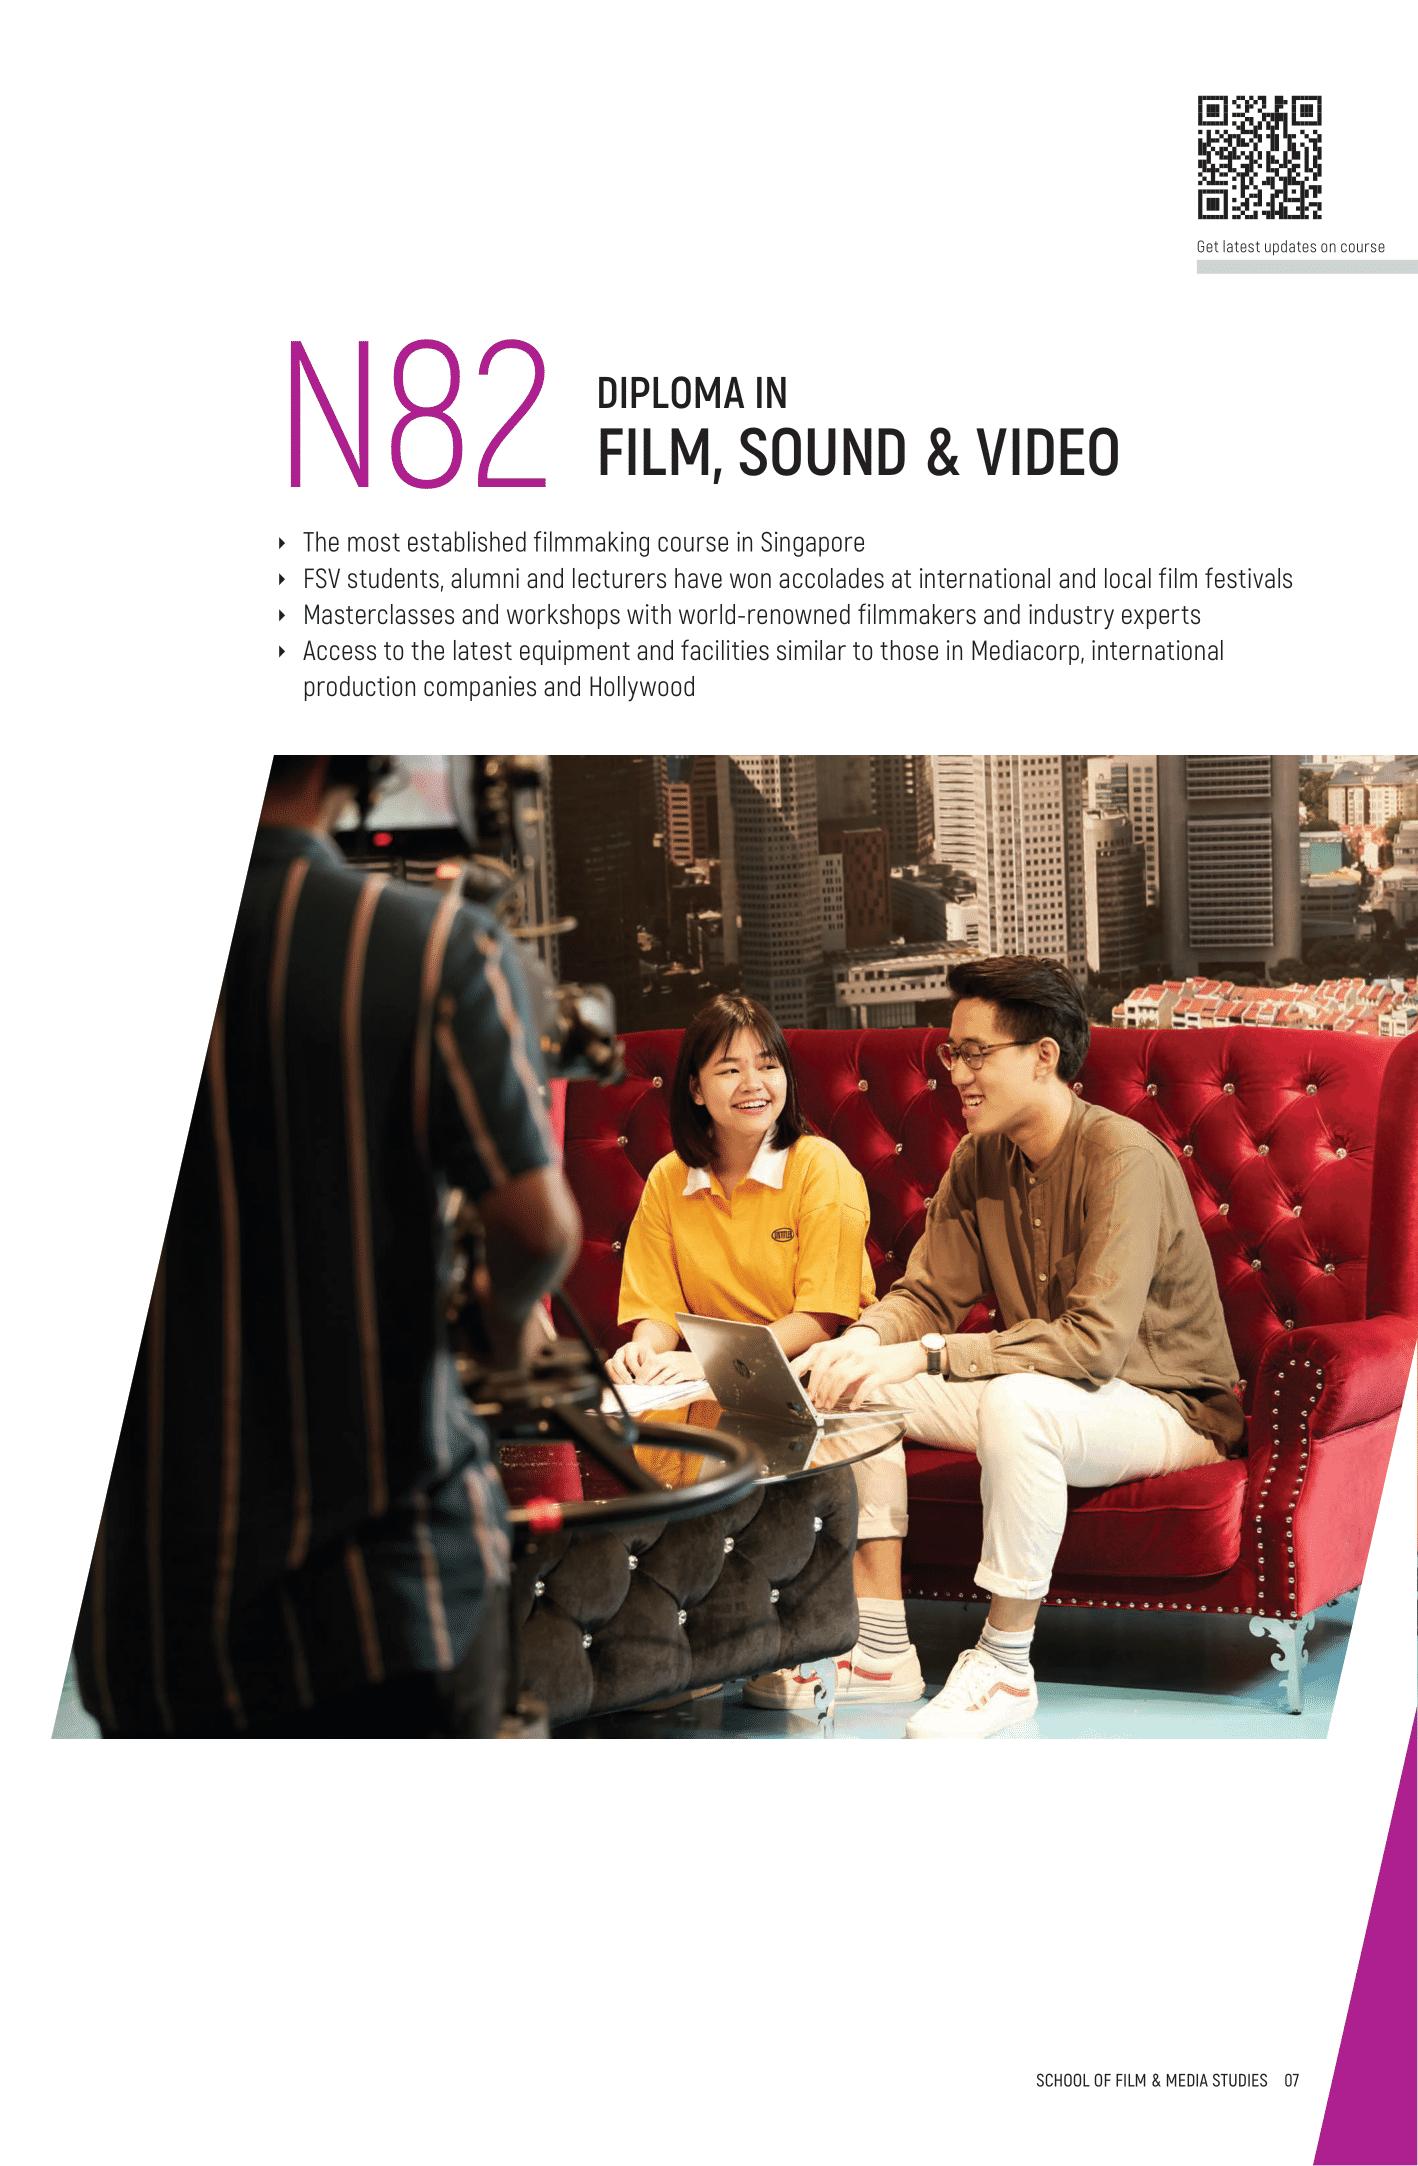 School of Film and Media Studies 2020-09